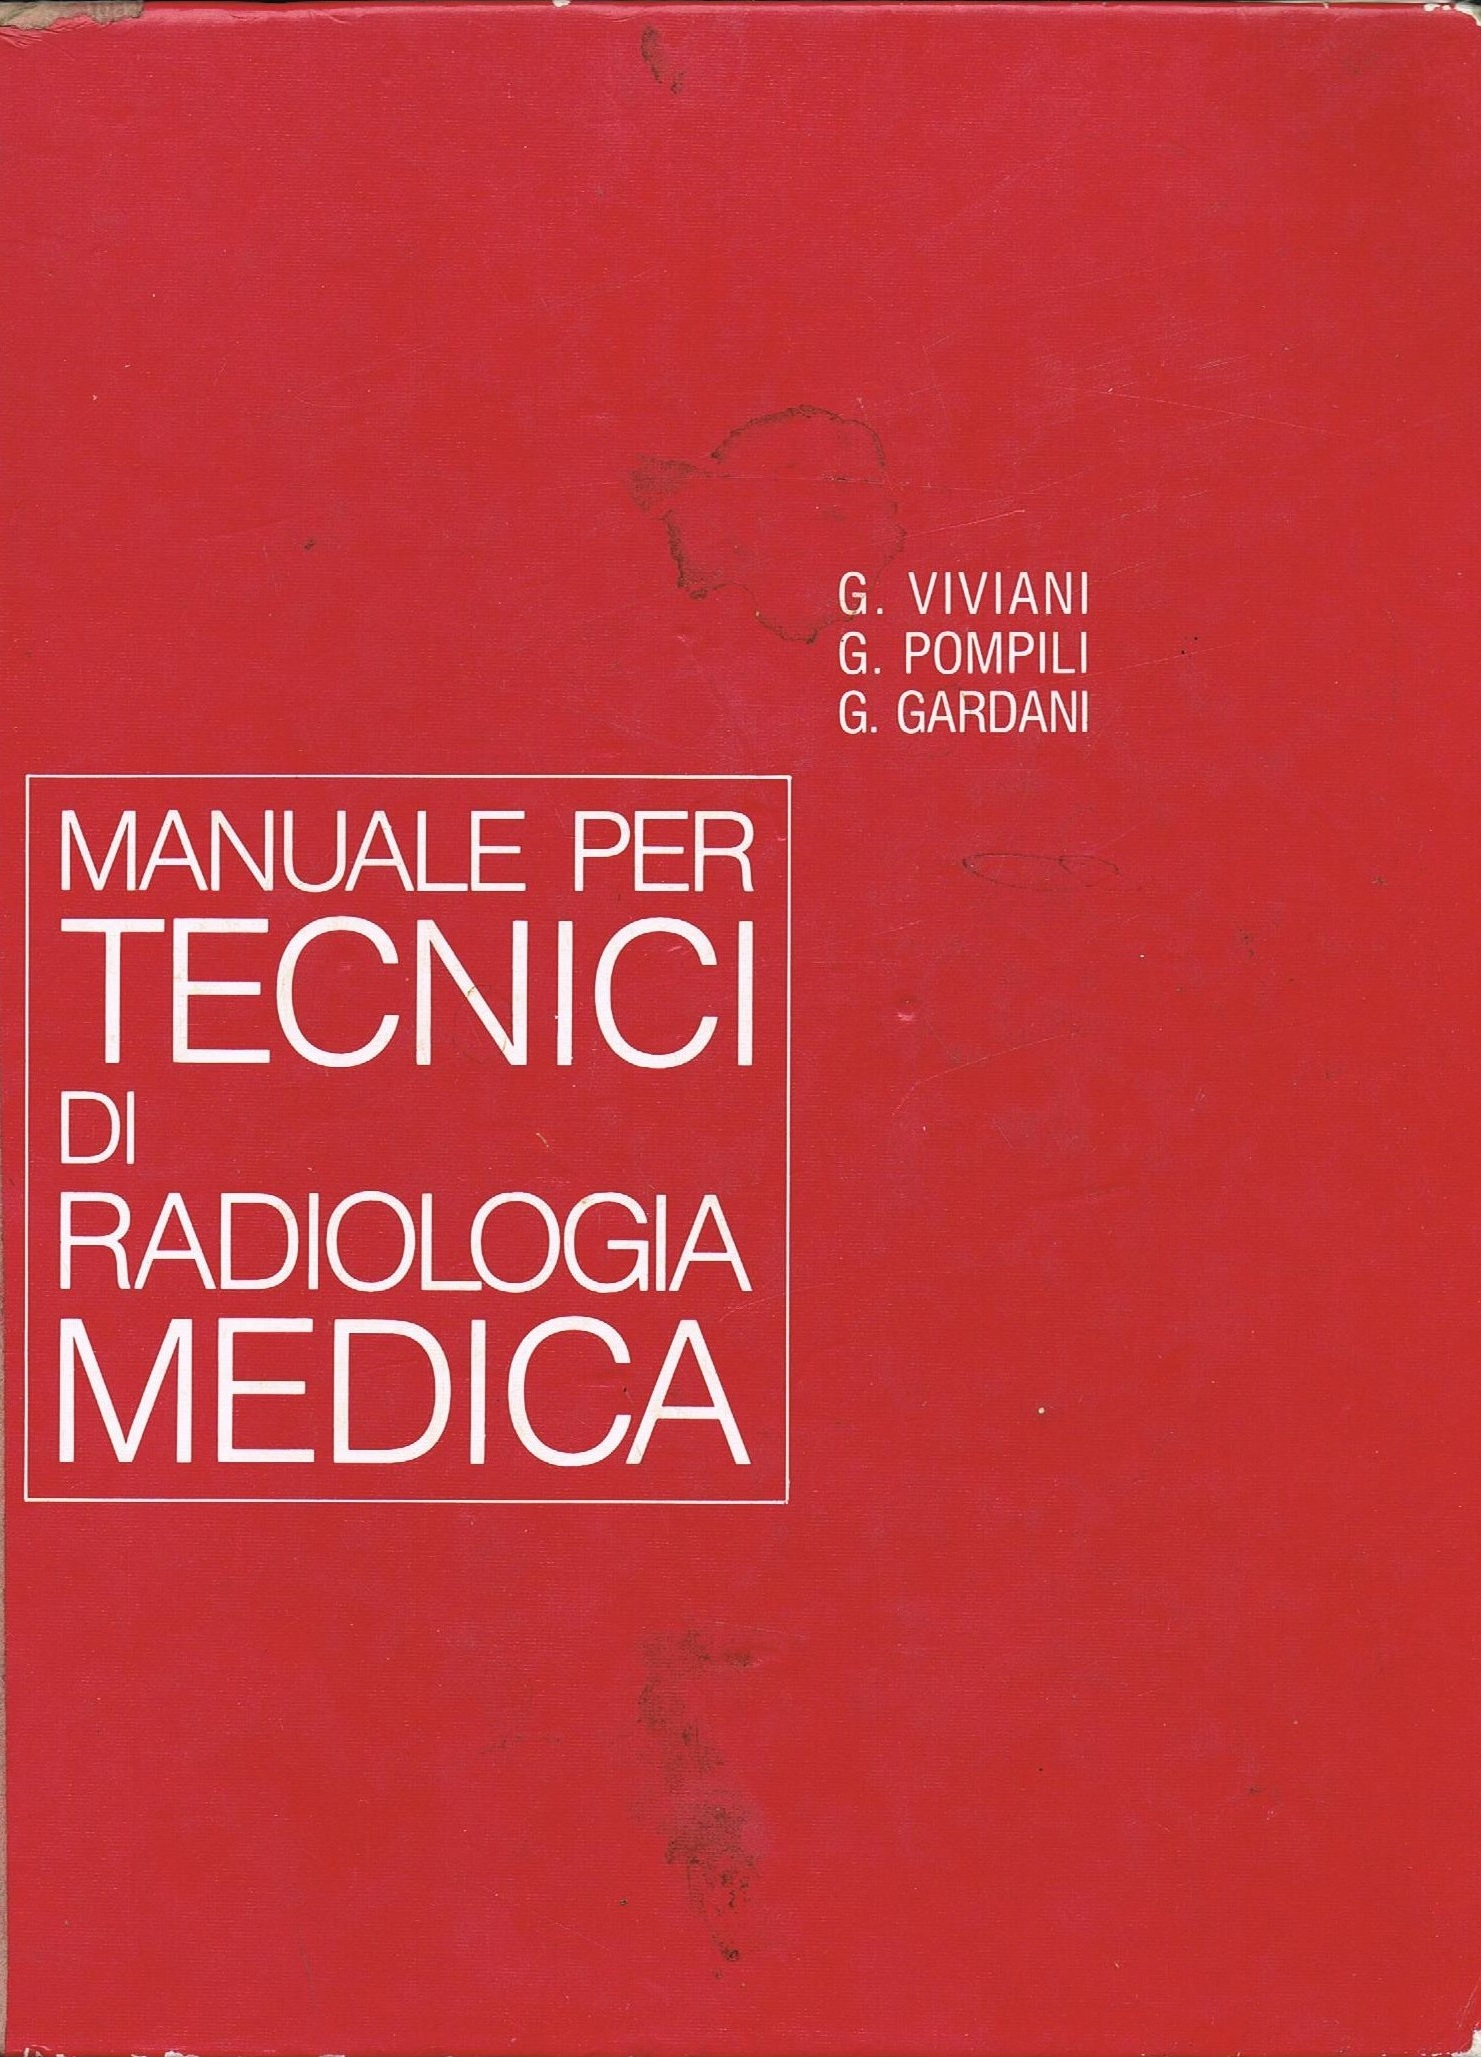 Manuale per tecnici di radiologia medica